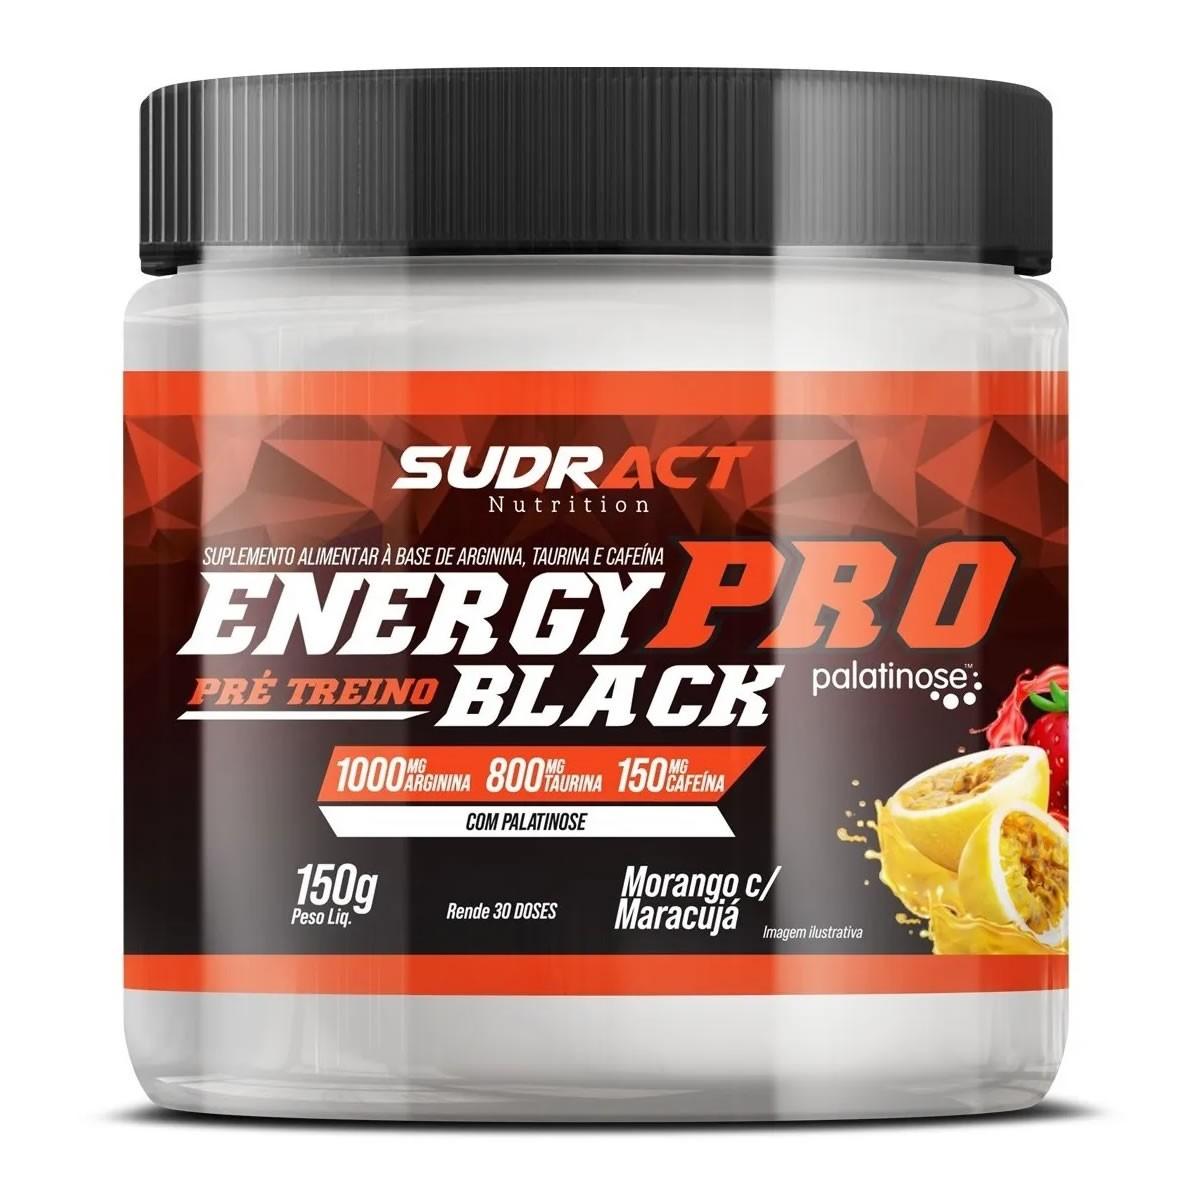 Energy Pro Black 150g - Sudract